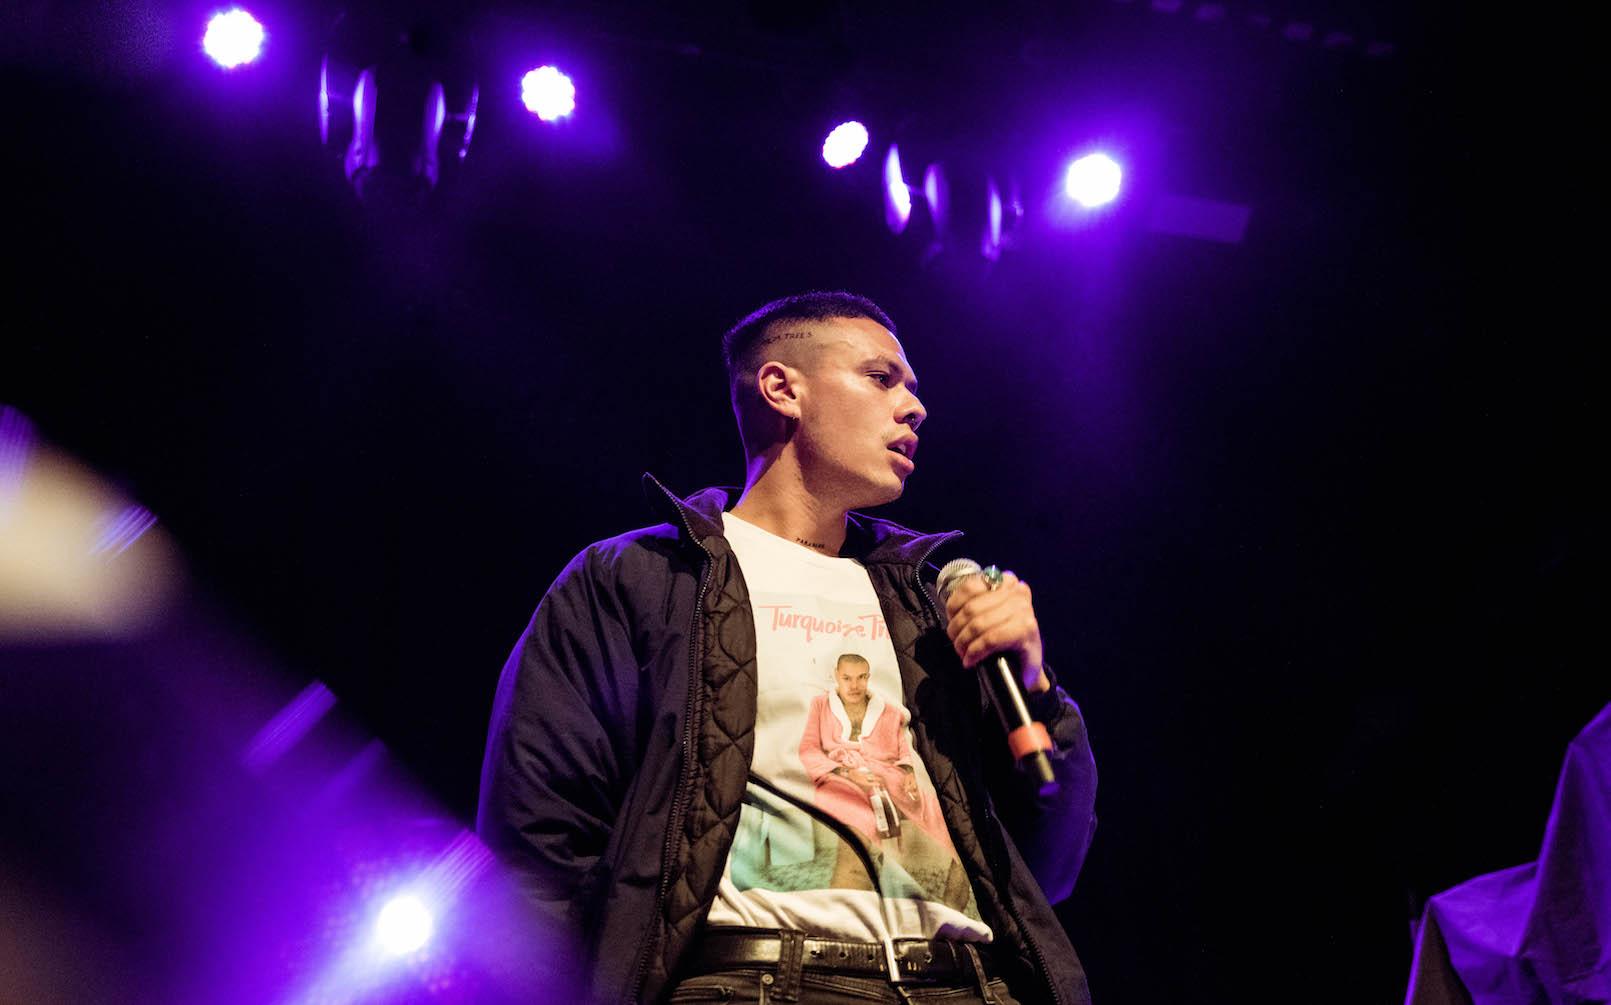 boo seeka music live review sydney turquoise prince photo credit dominique burns blackwell savage thrills savagethrills 1